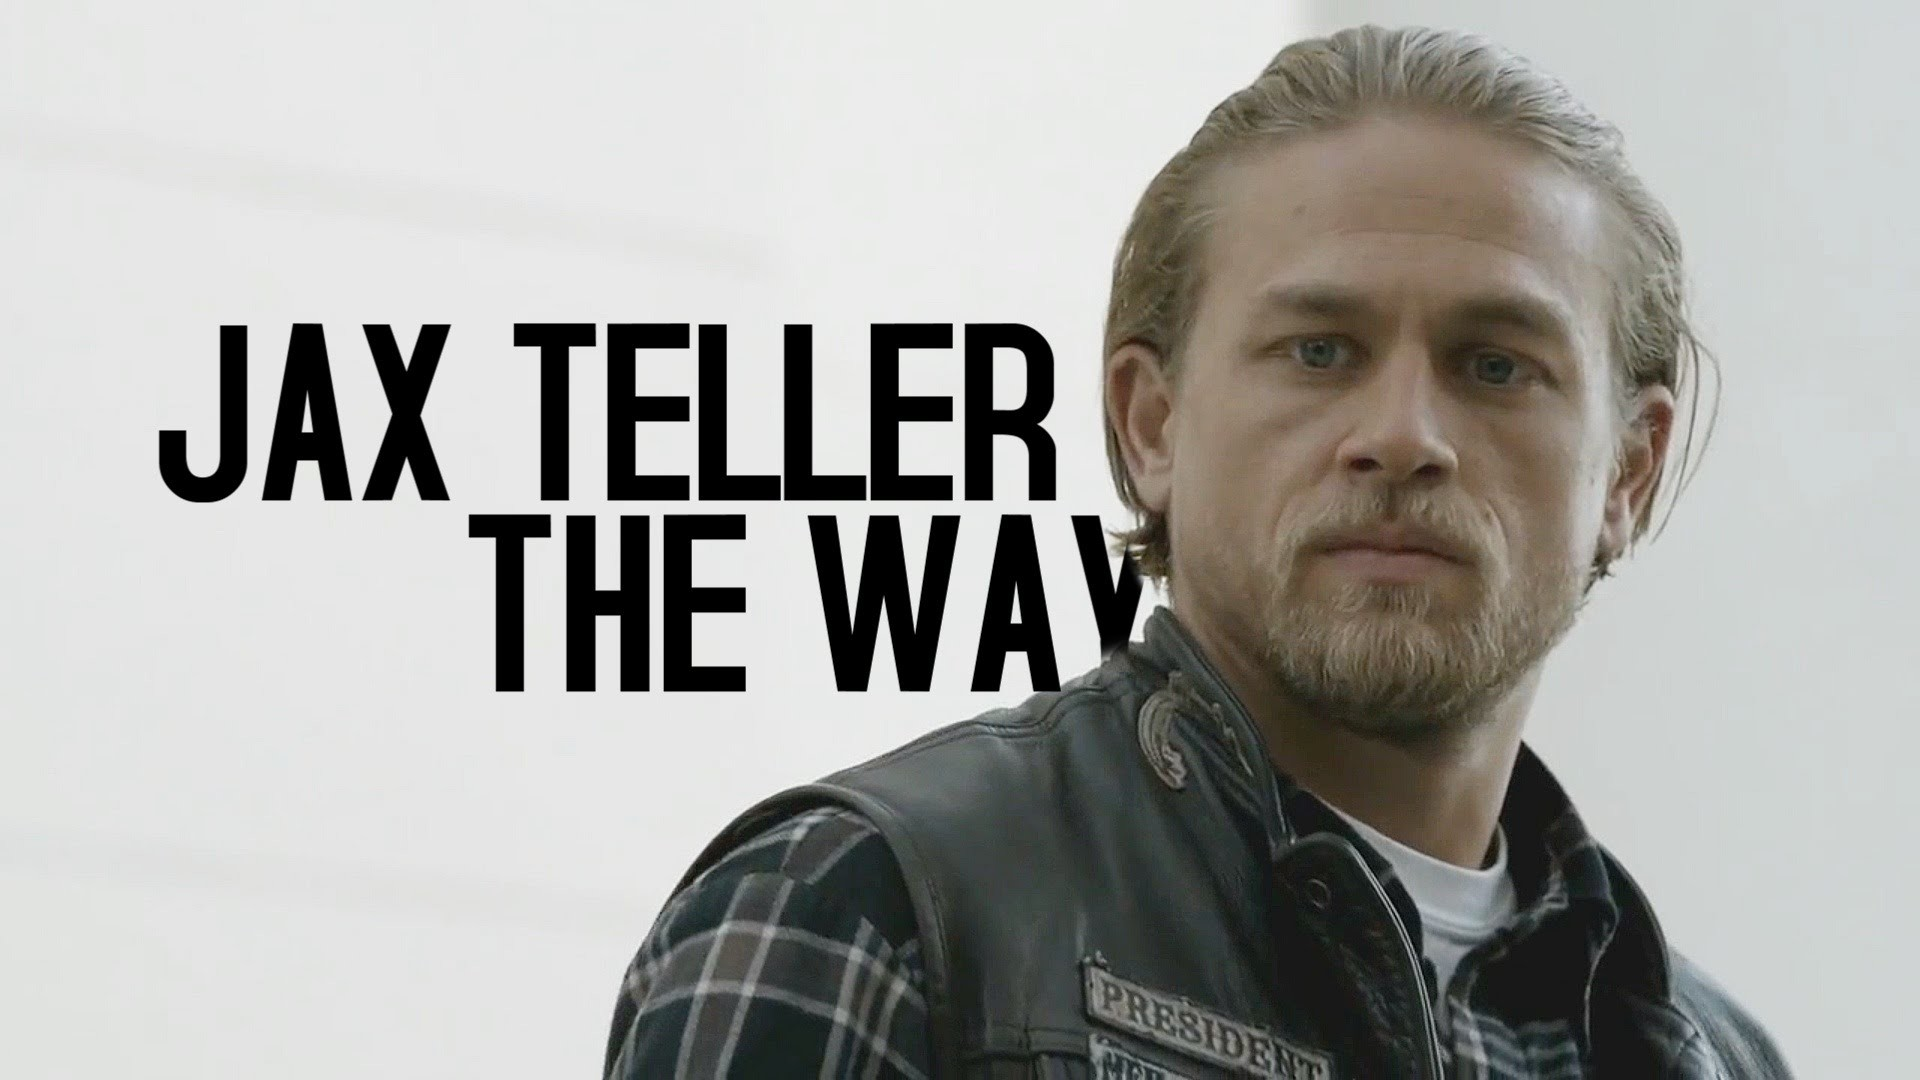 """The Way"", Jax Teller. [For BuildingAMystery1]"